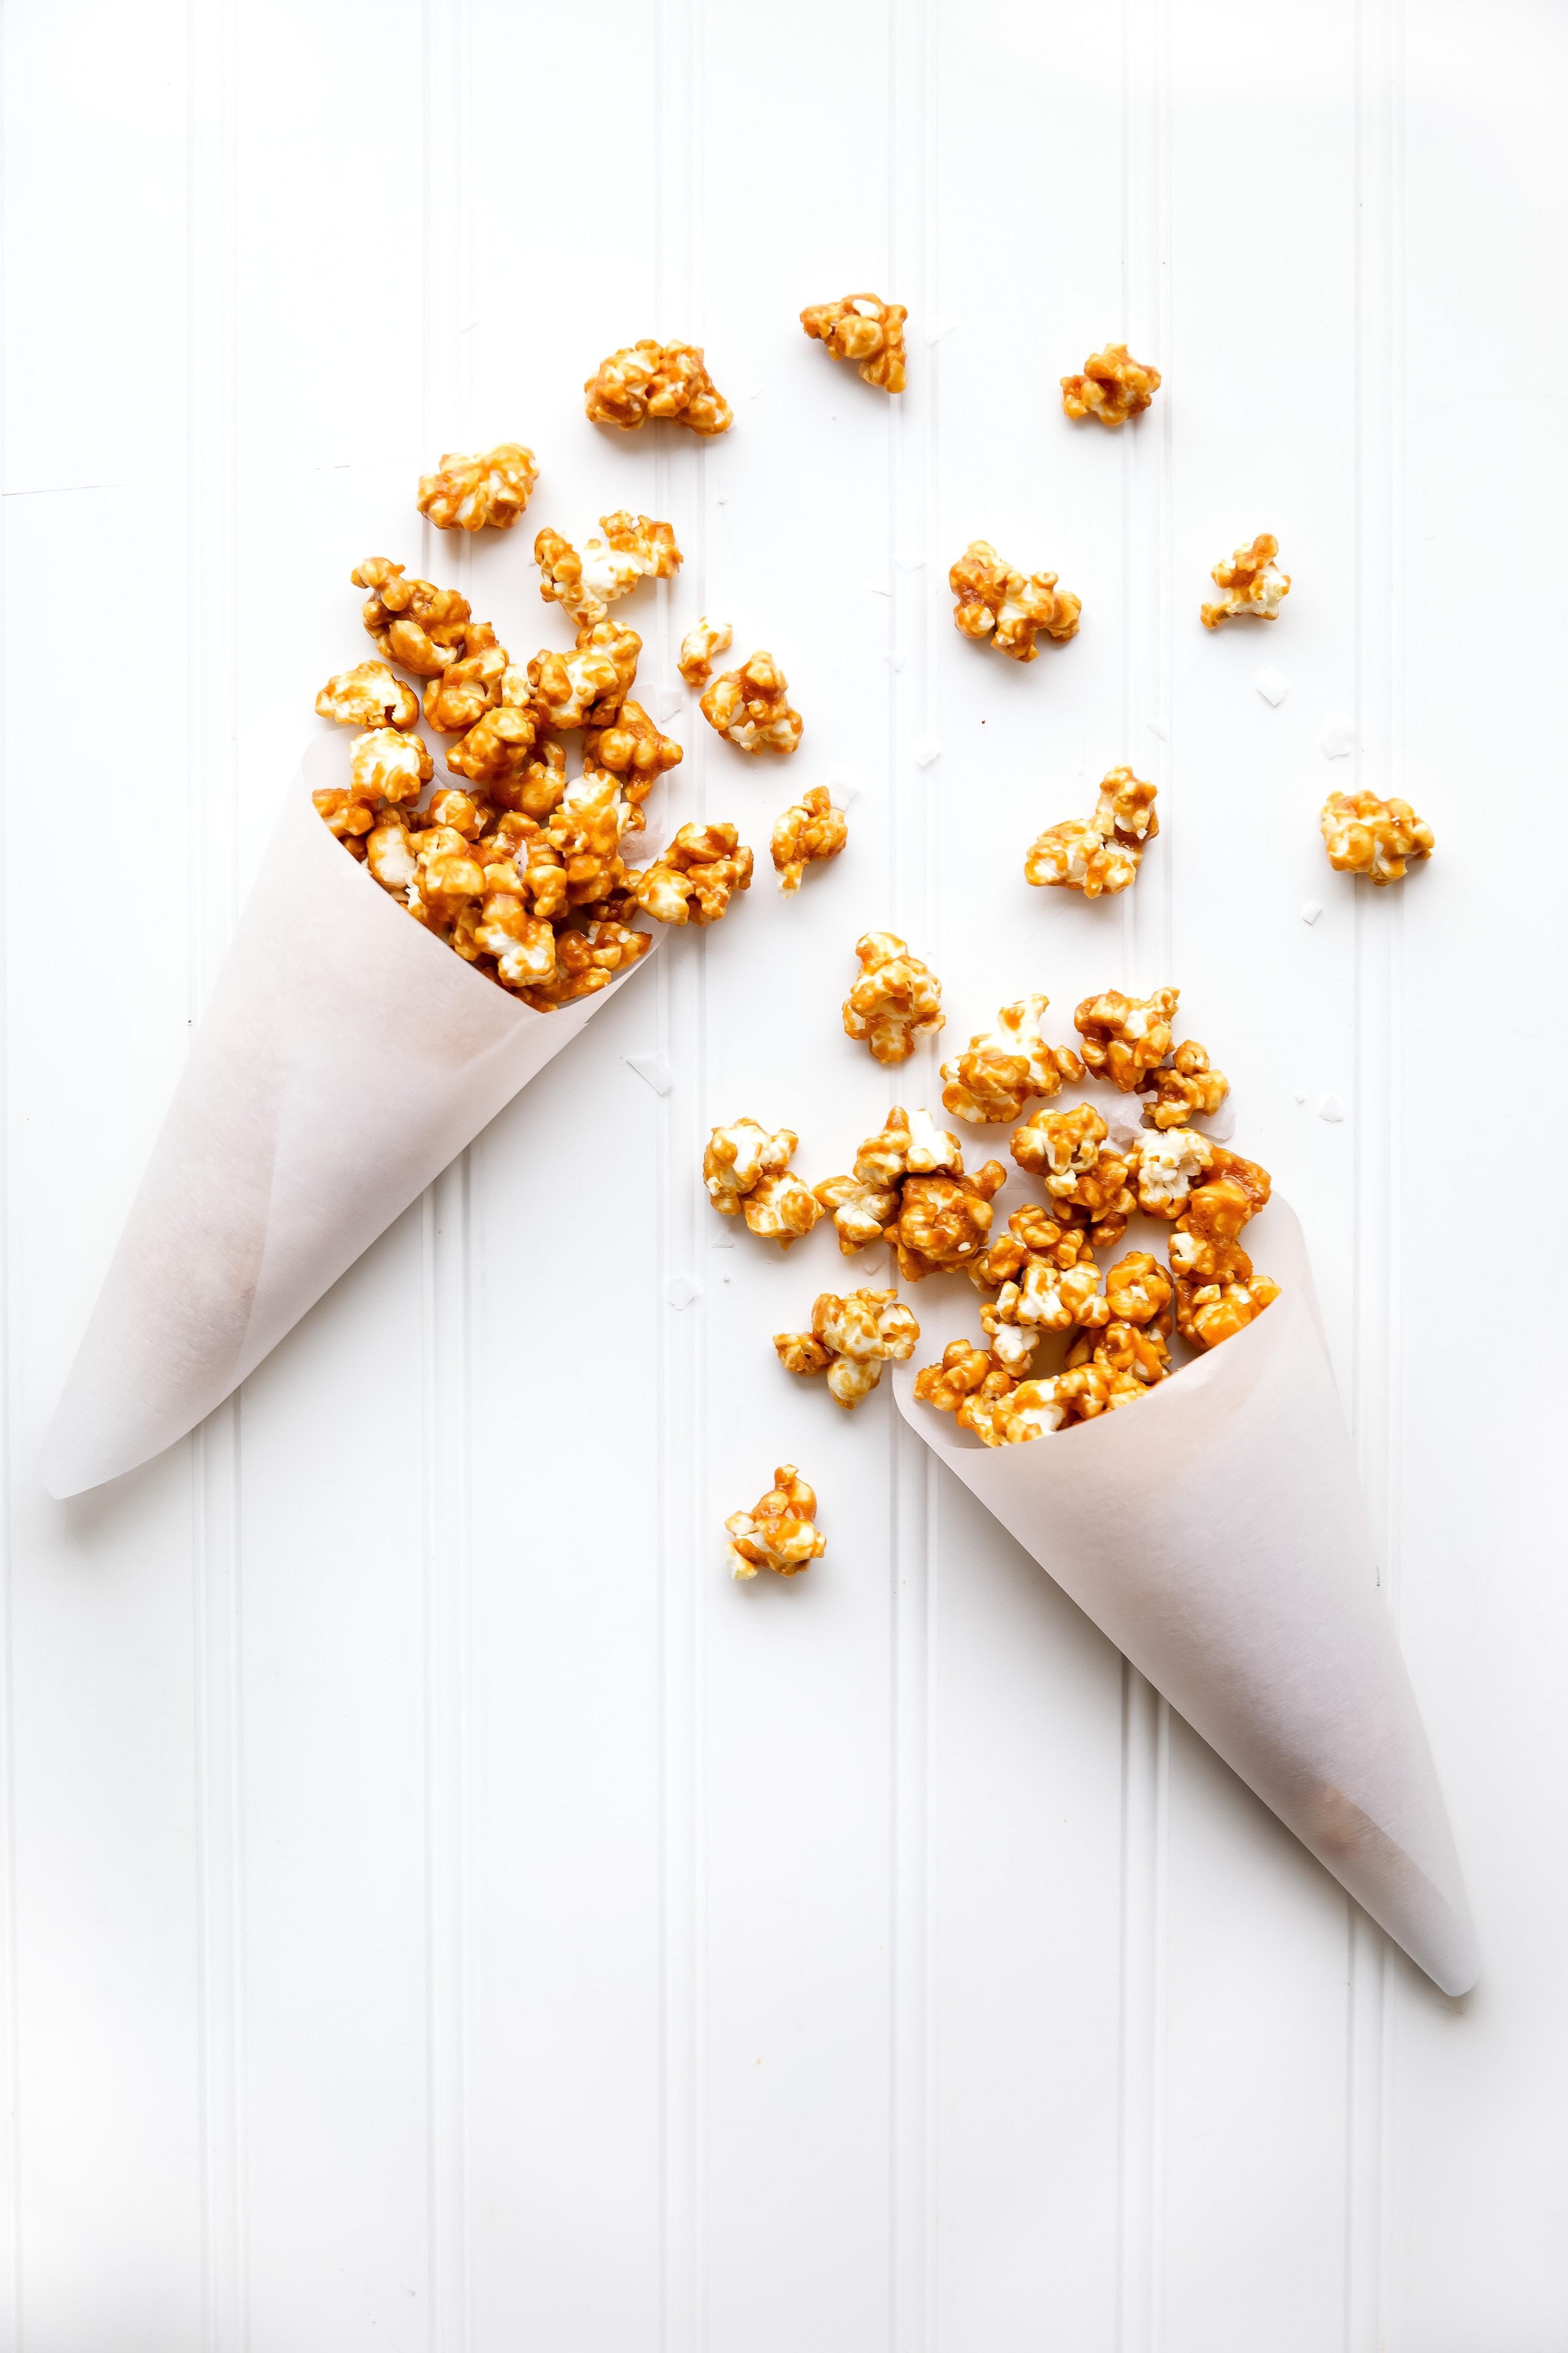 Salted Caramel Popcorn | Broma Bakery